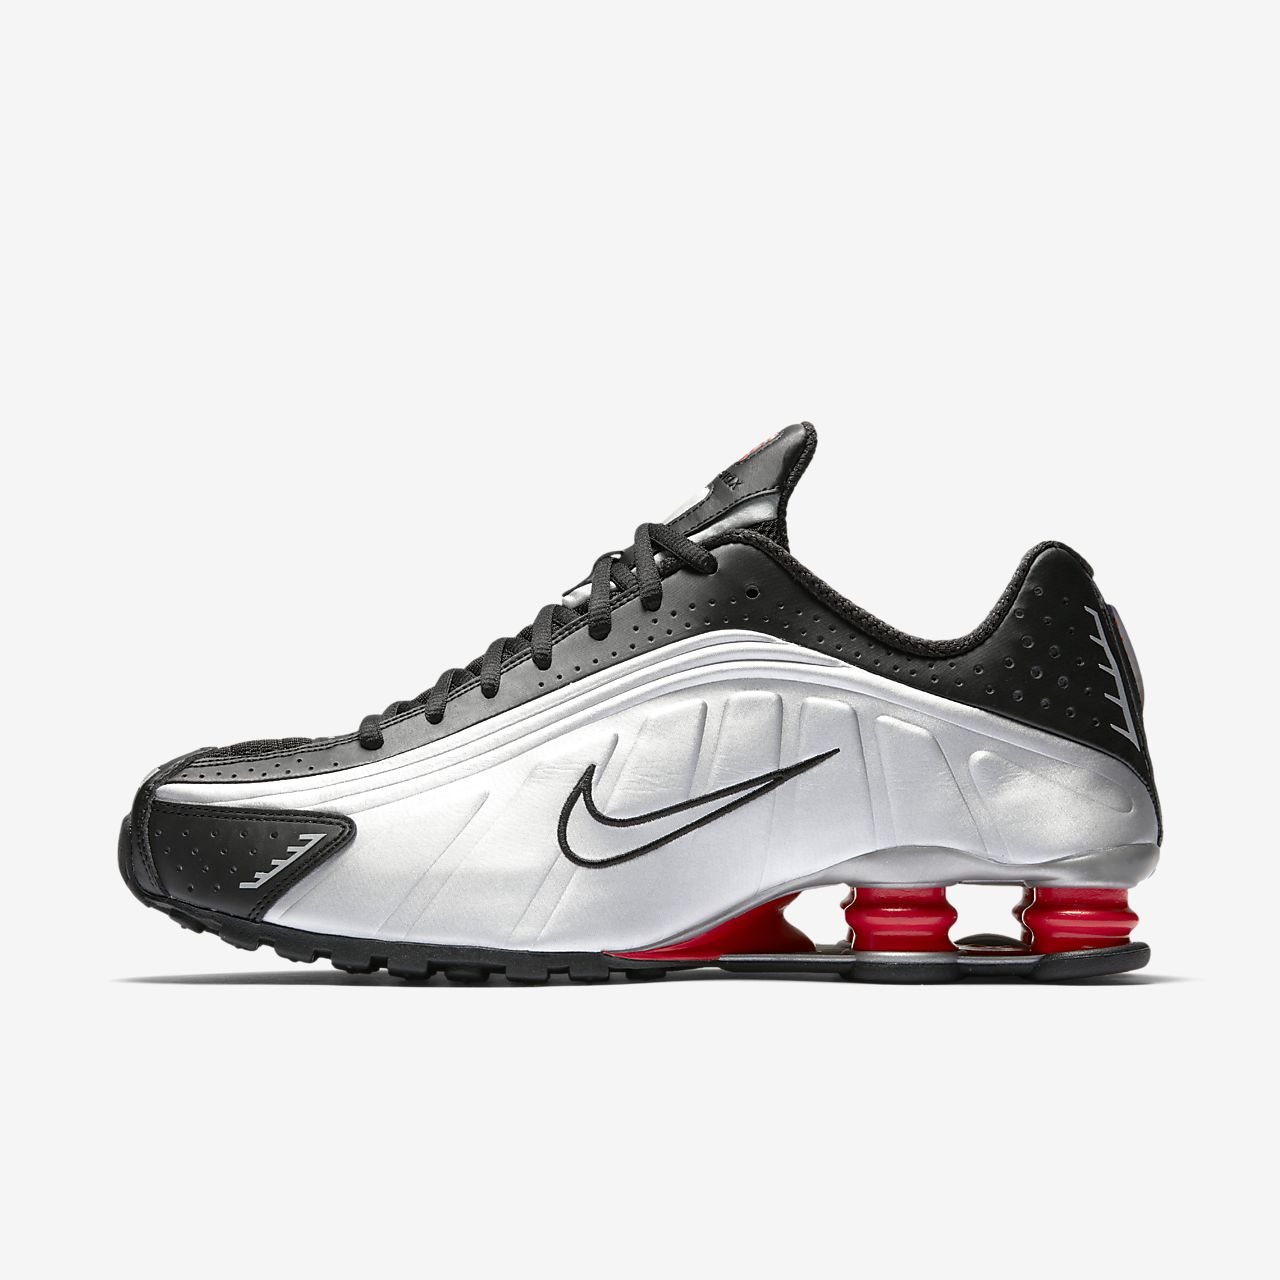 Bota Nike Shox R4